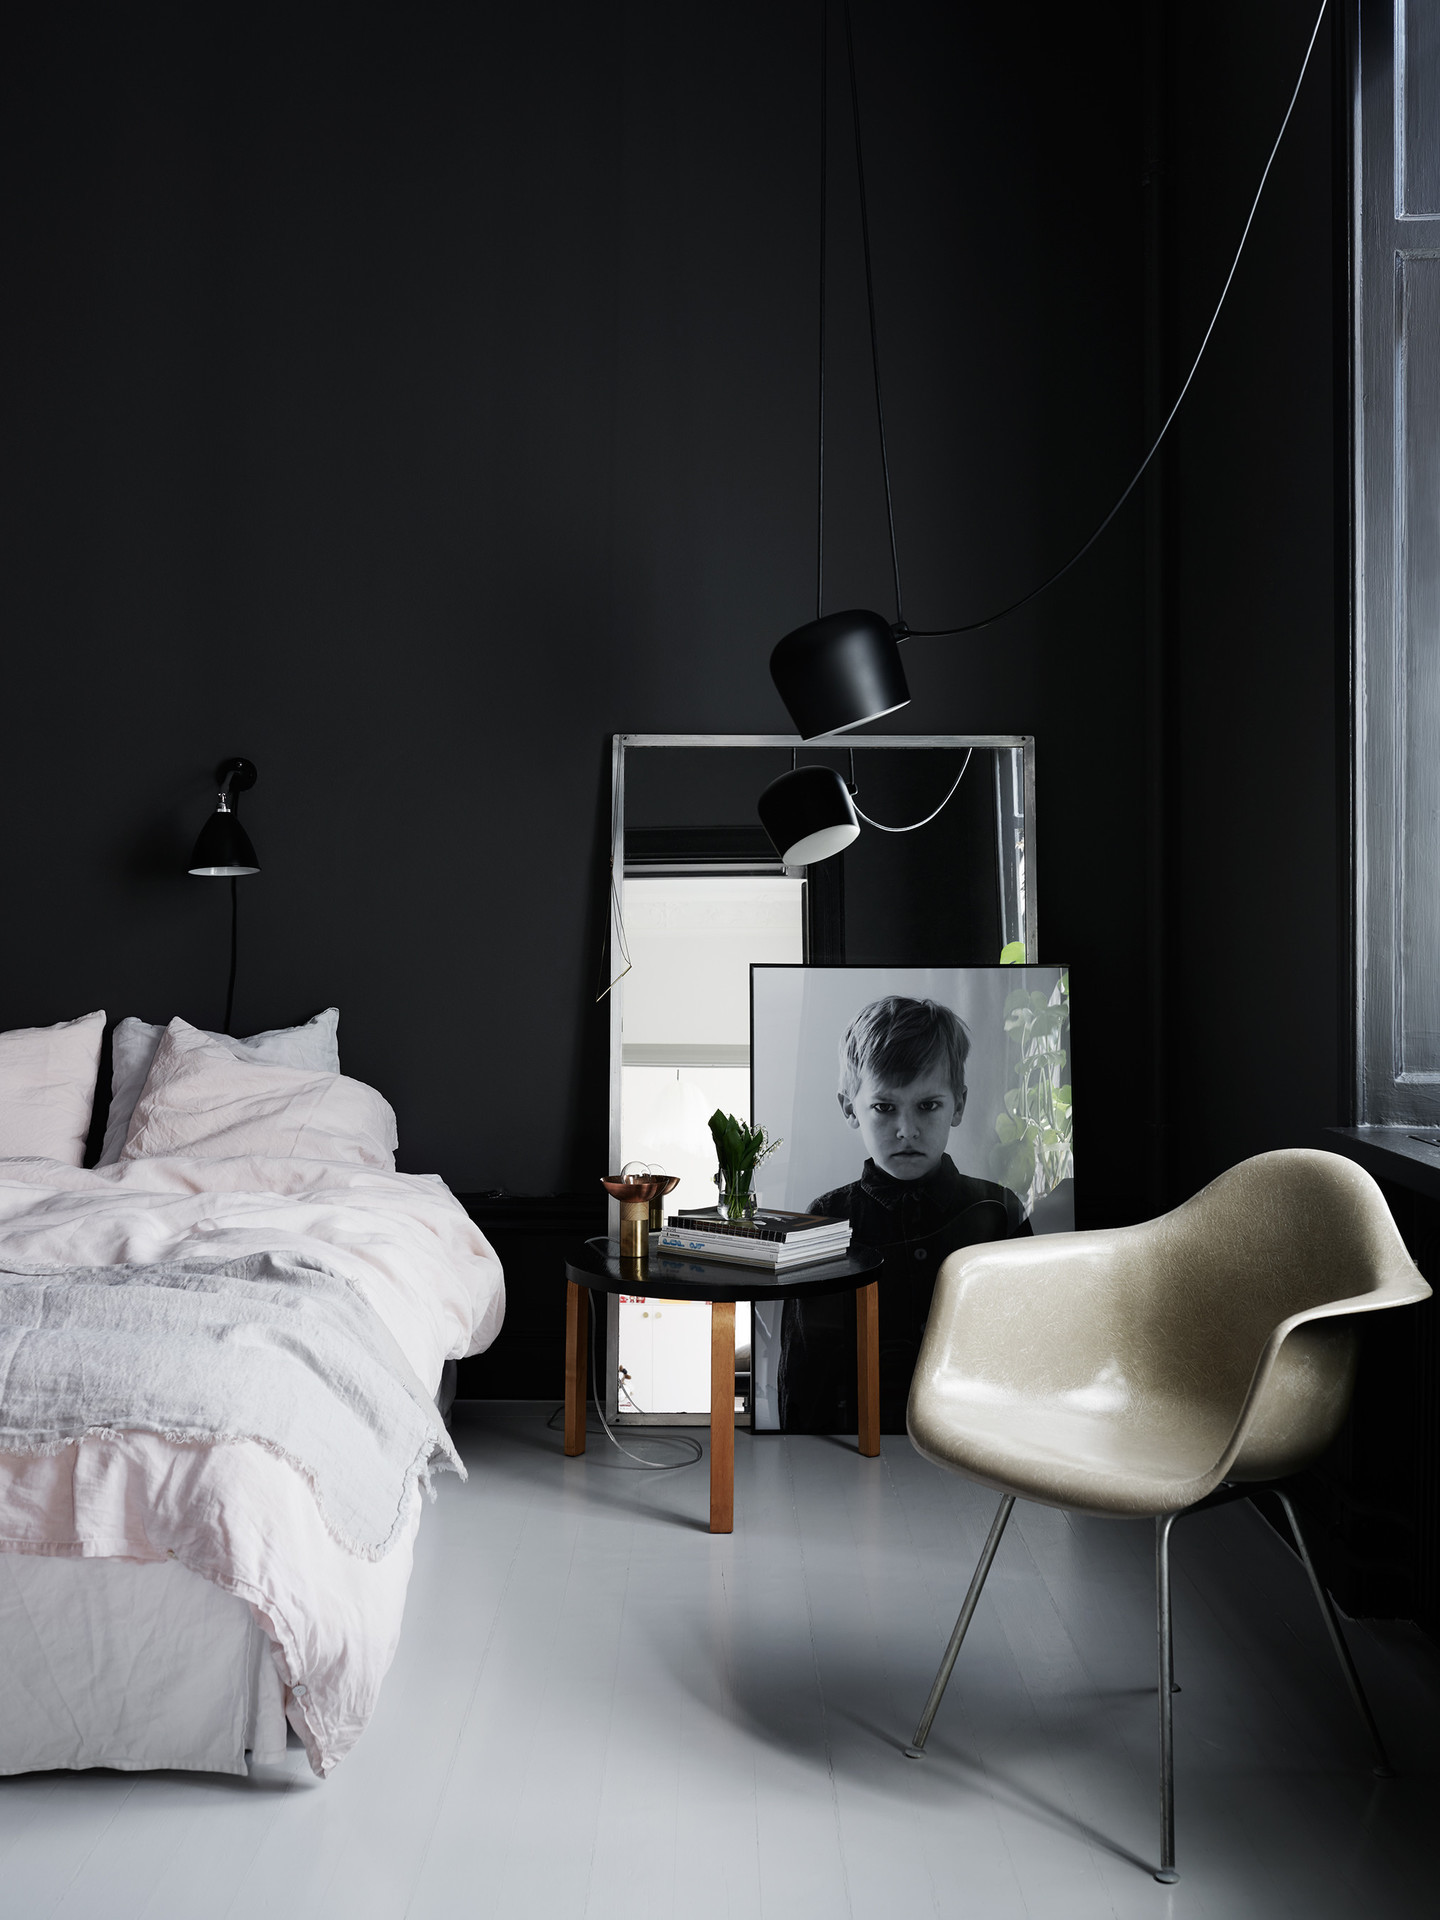 kristoferjohnsson-interiors-87554034_w1440